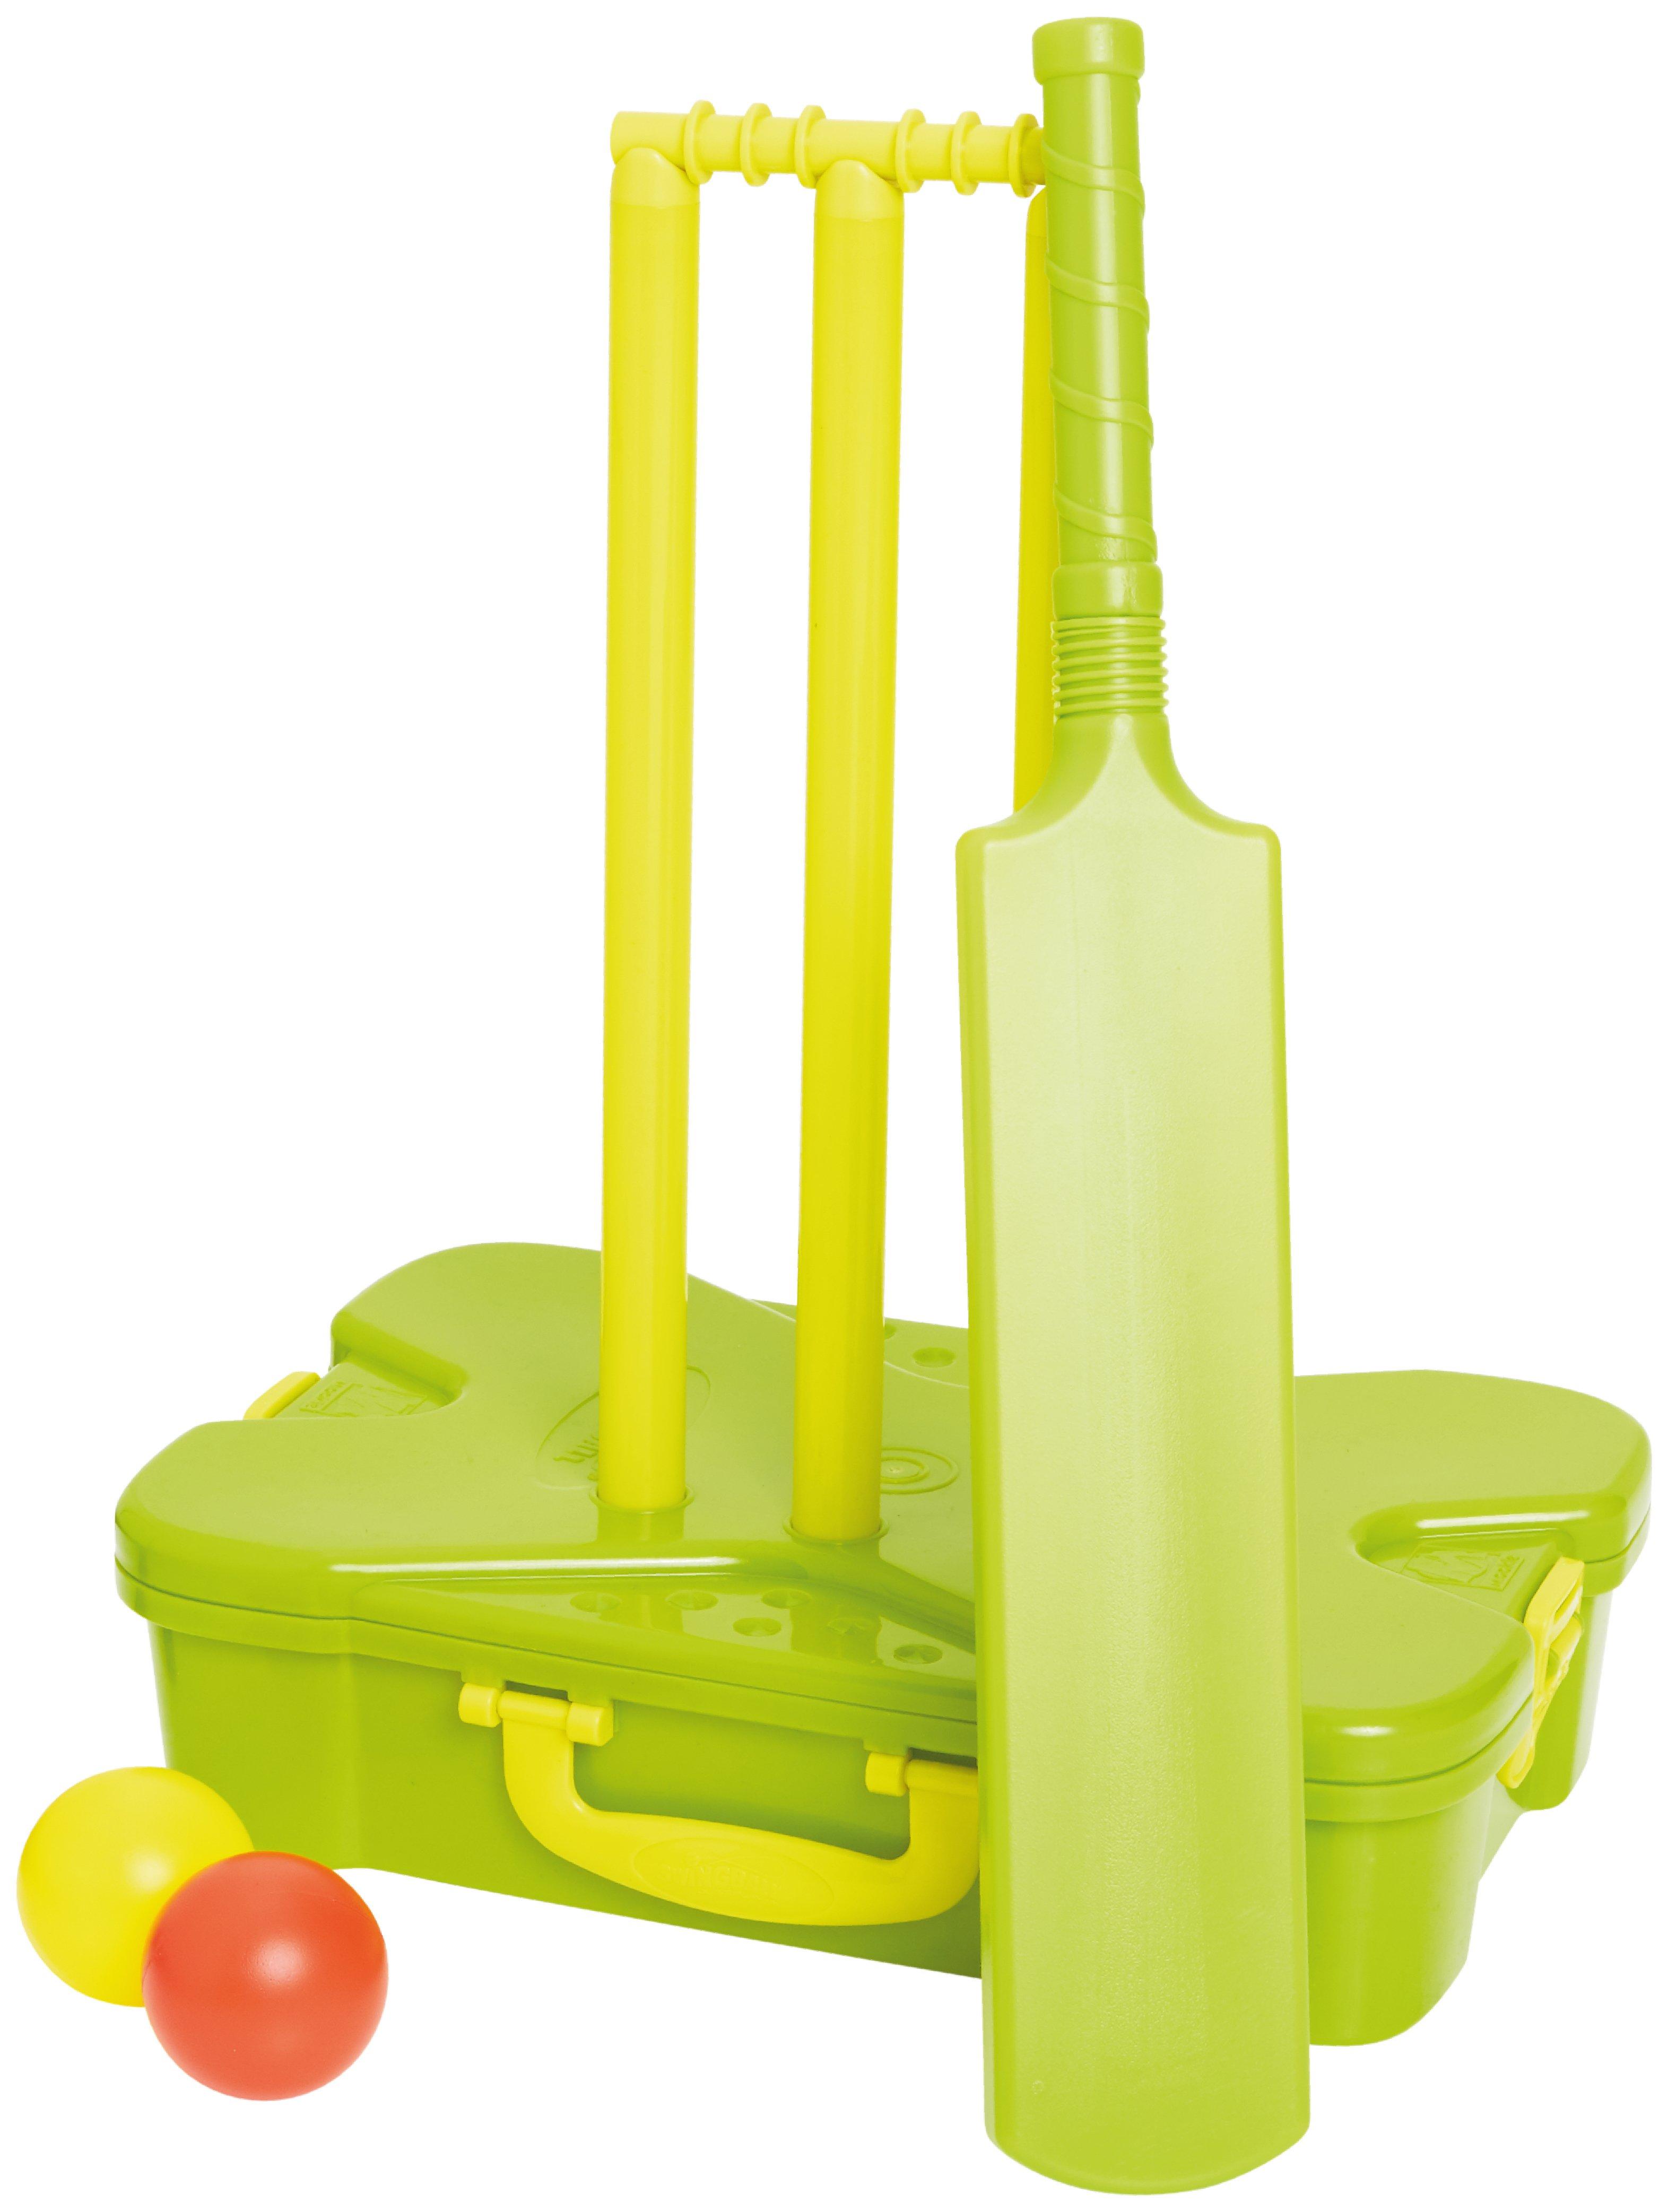 Swingball - My First Cricket Set